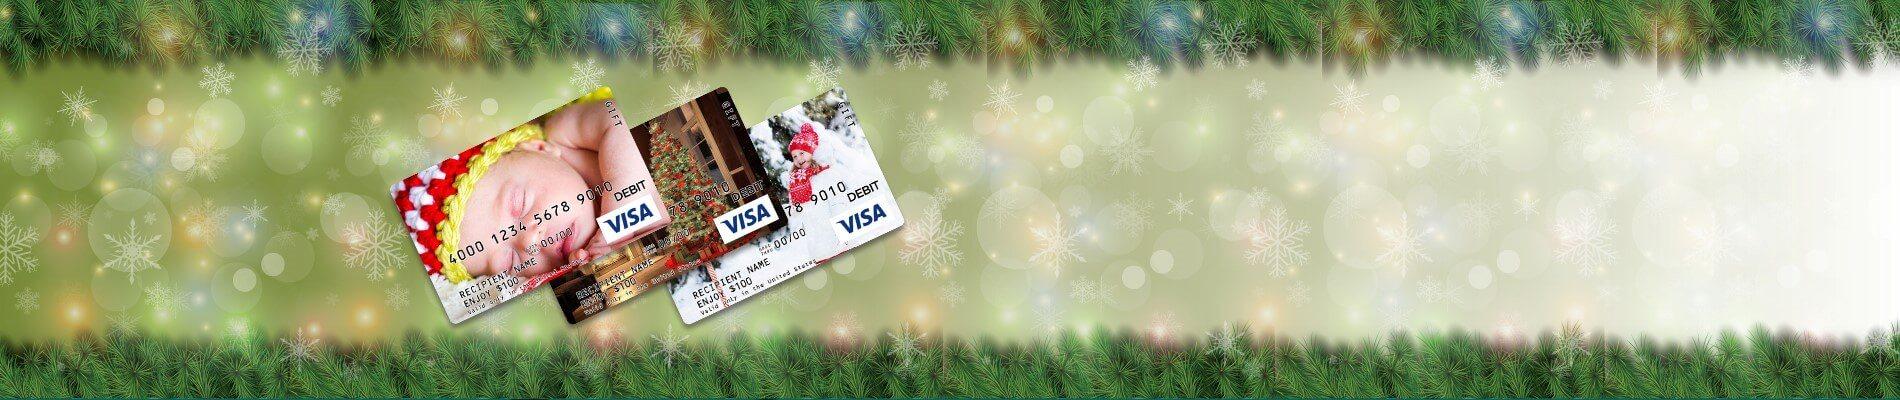 Visa Gift Cards